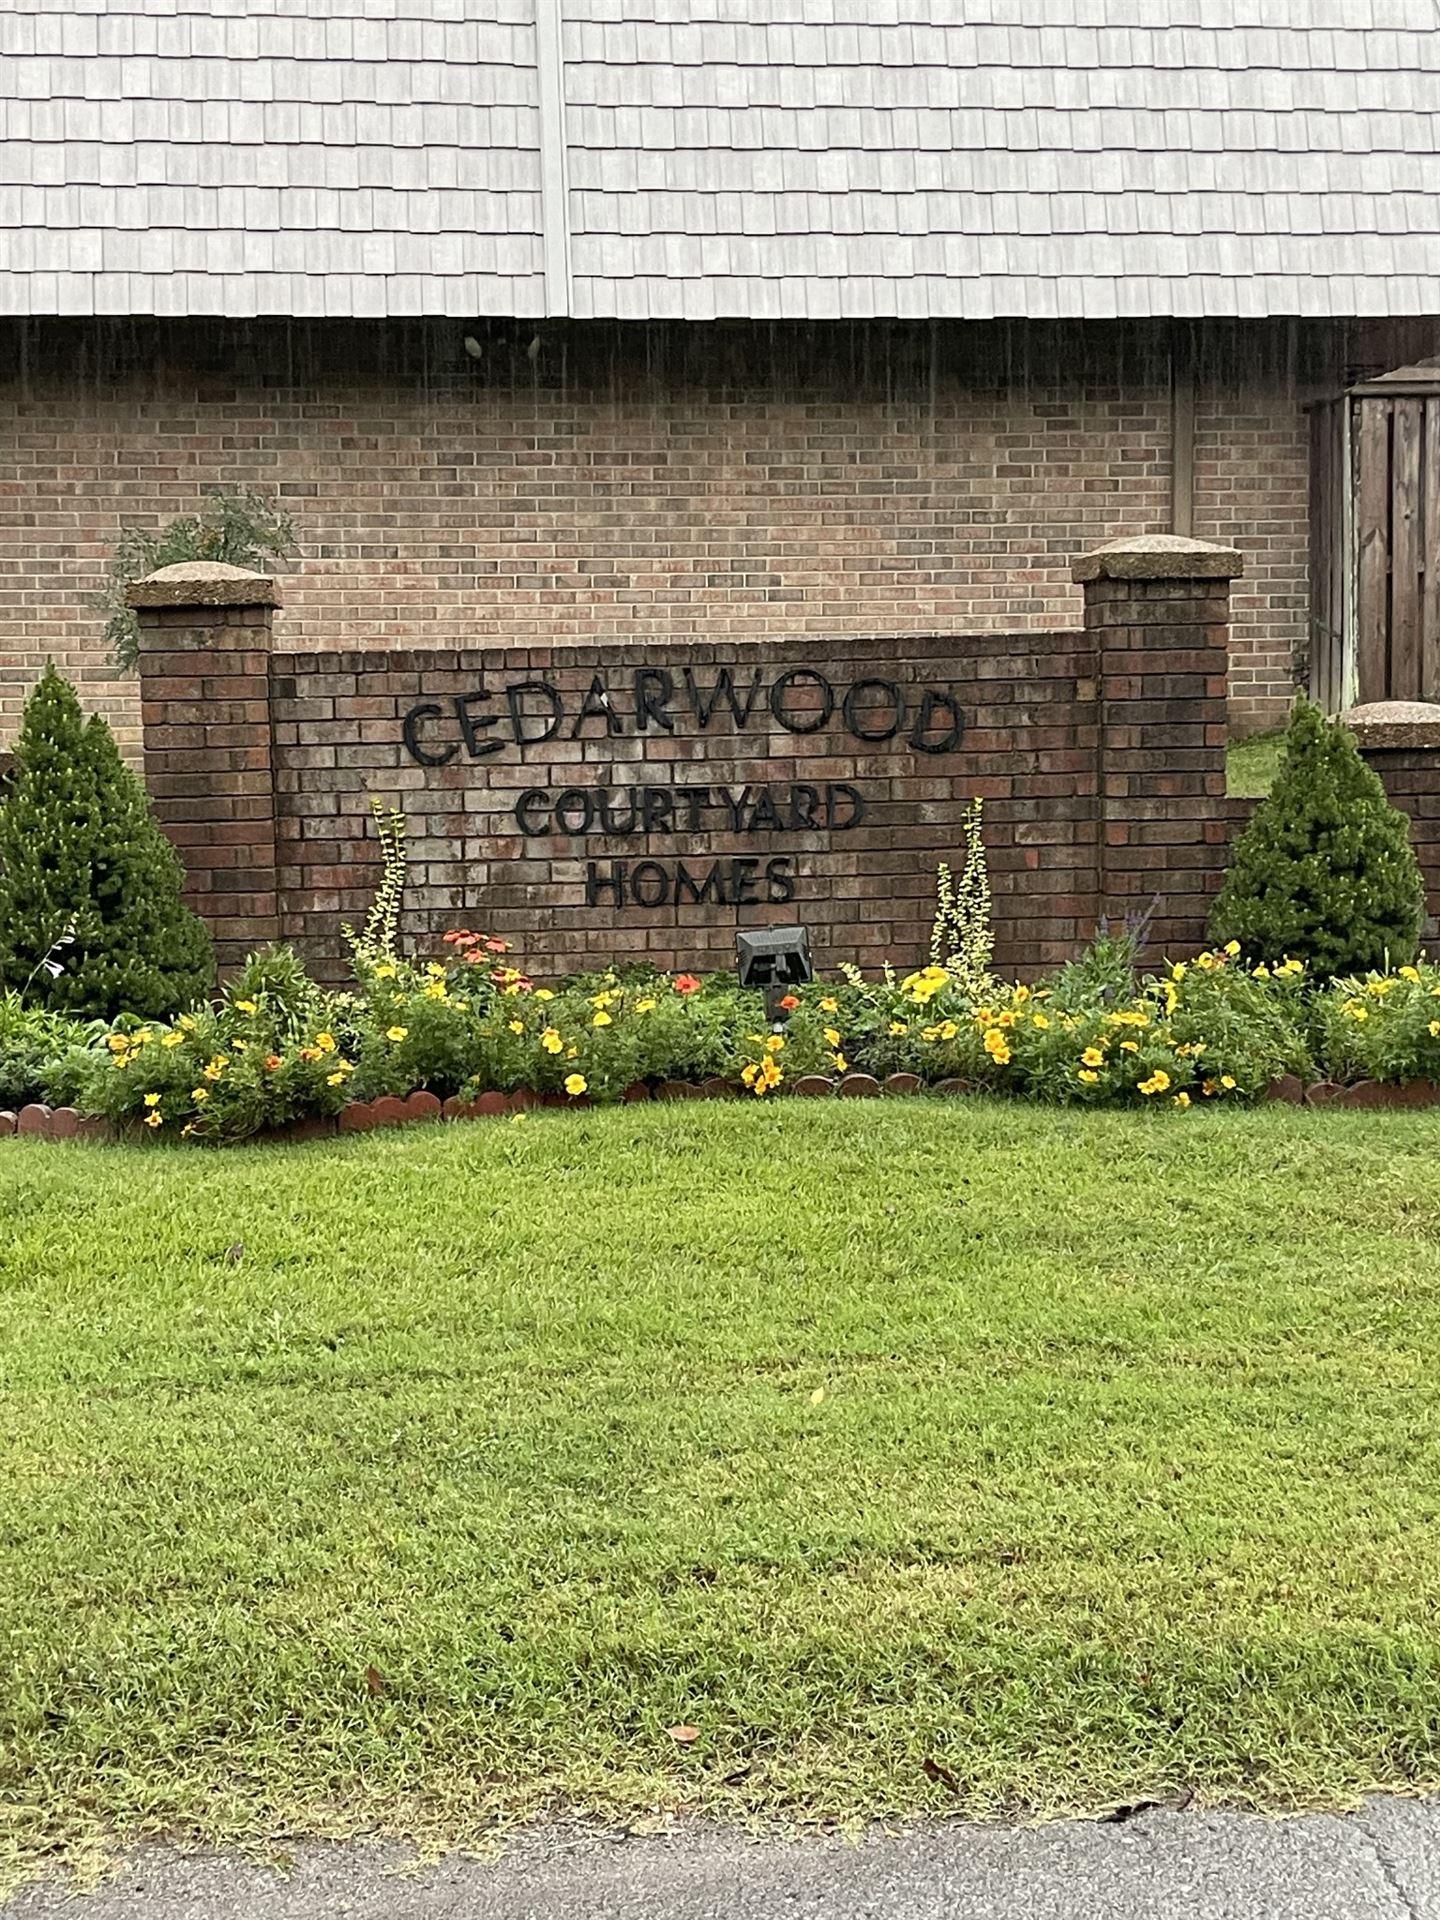 106 Cedarwood Ln #106, Madison, TN 37115 - MLS#: 2298027